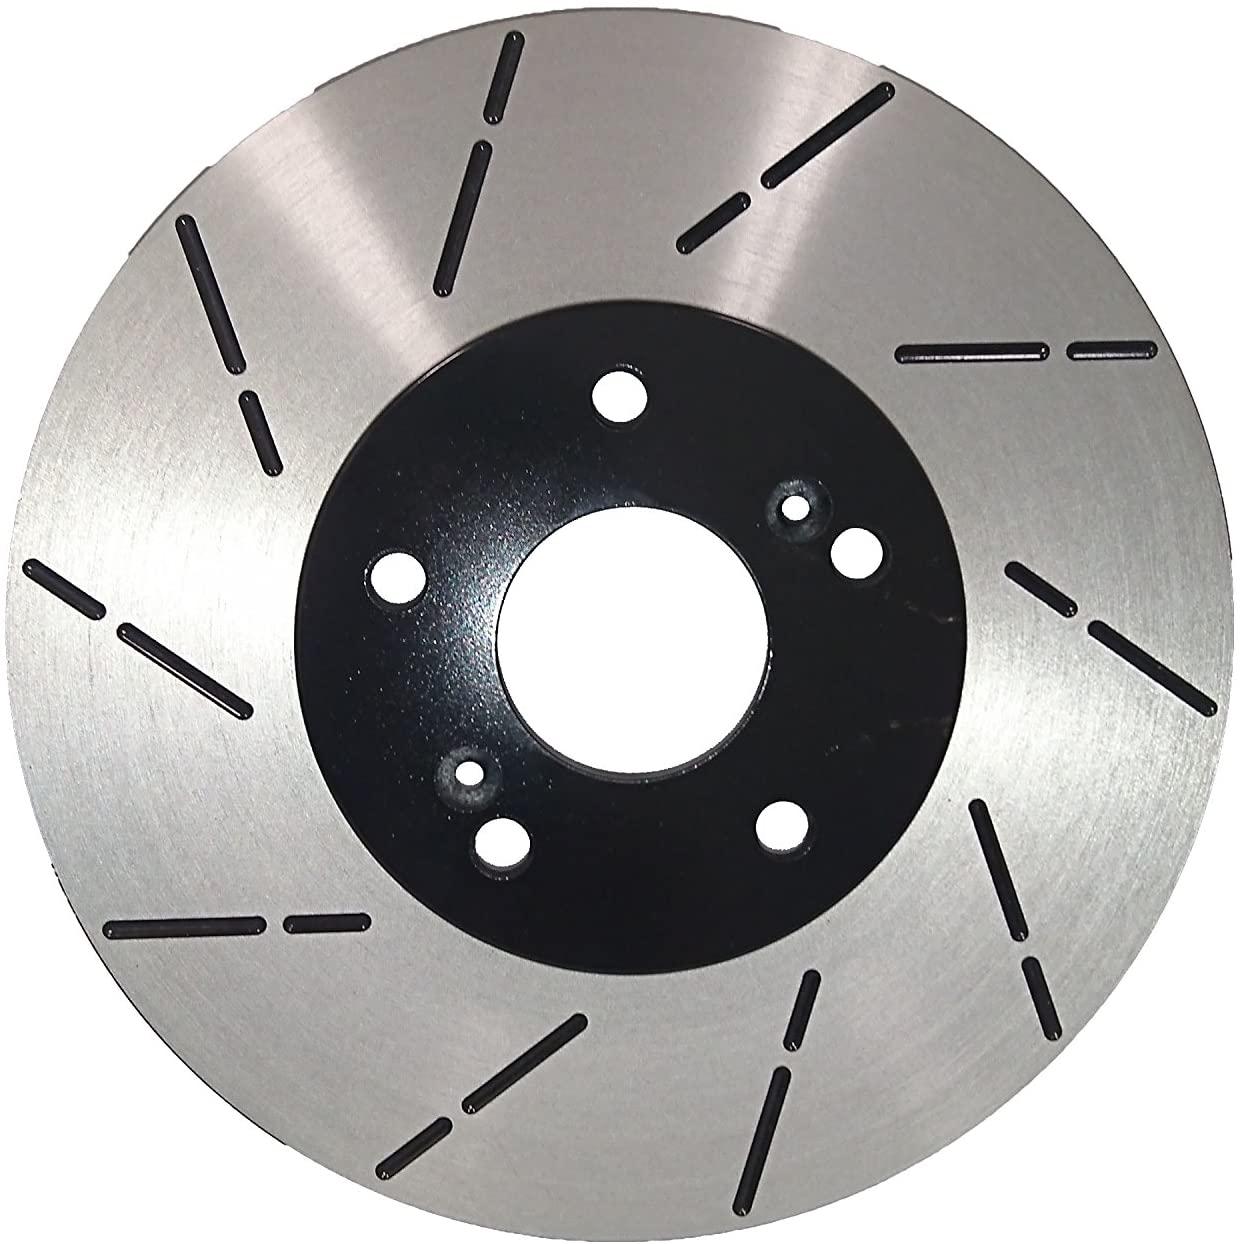 [Front Slott Brake Rotors Ceramic Pads] Fit 01-06 Hyundai Santa Fe 10.86